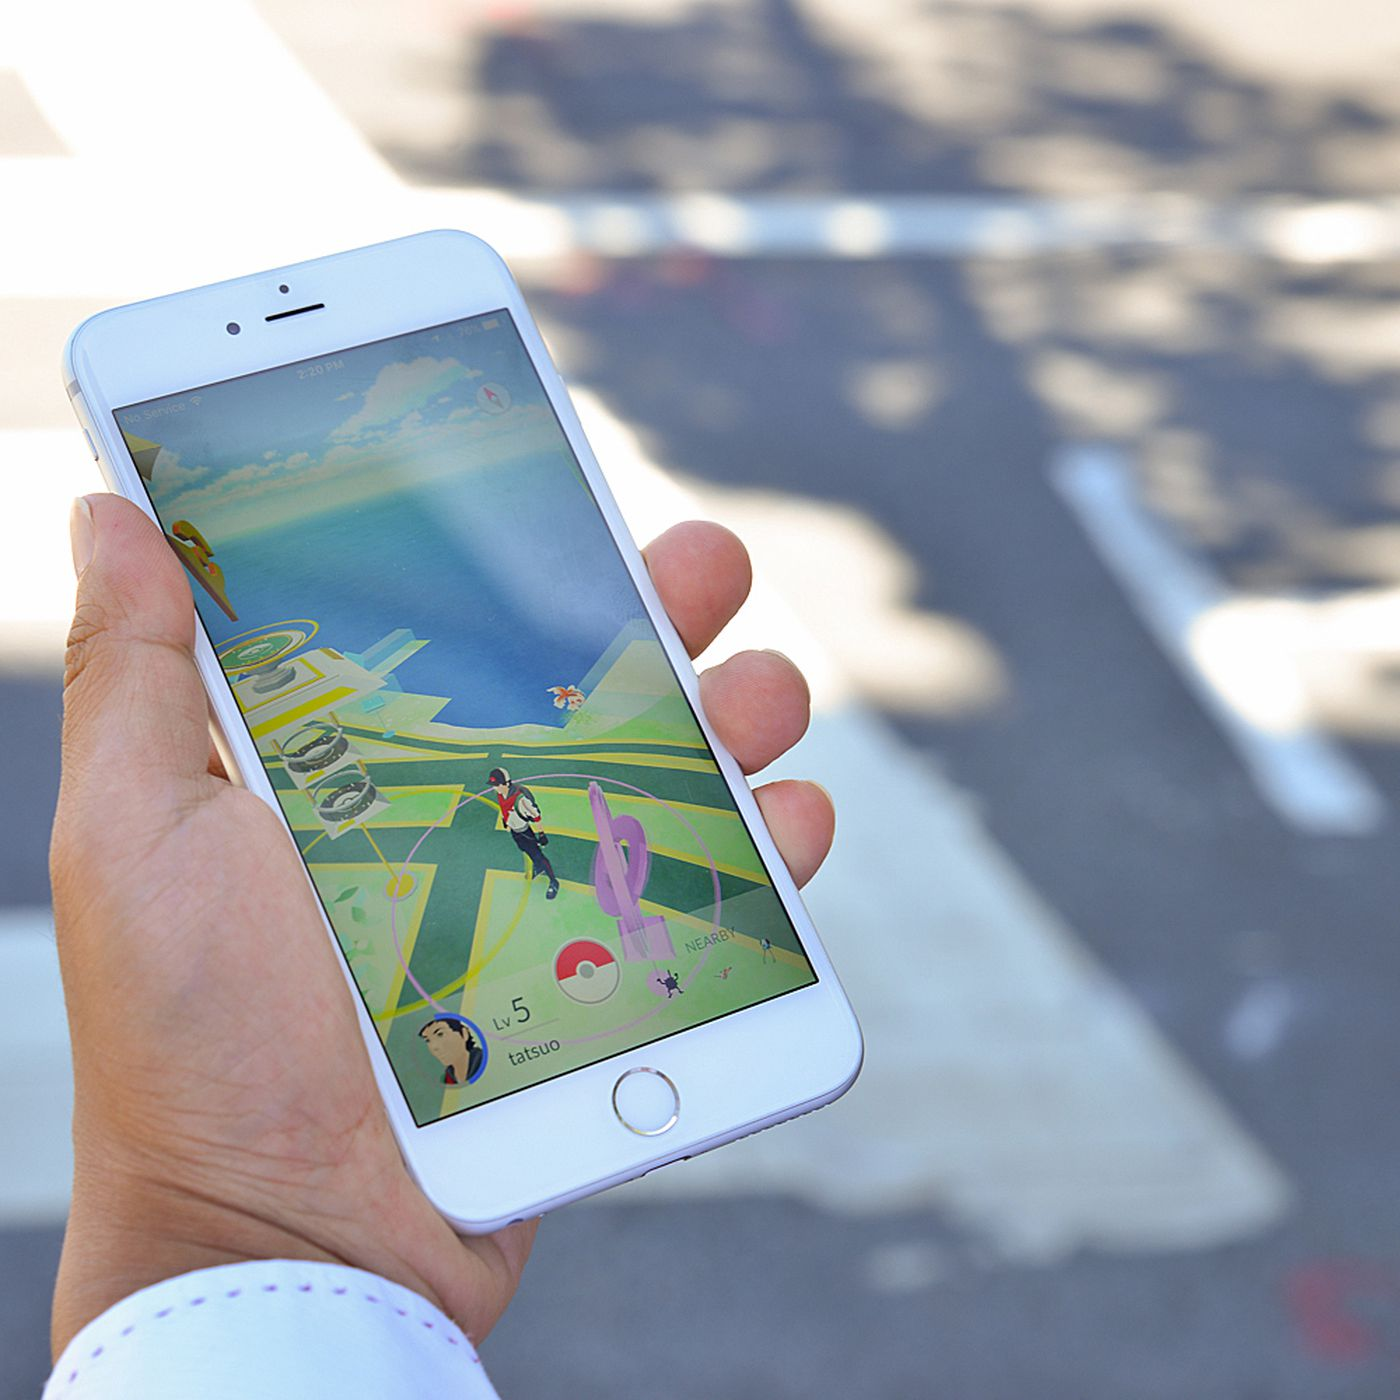 Pokémon Gos Success Adds 75 Billion To Nintendos Market Value